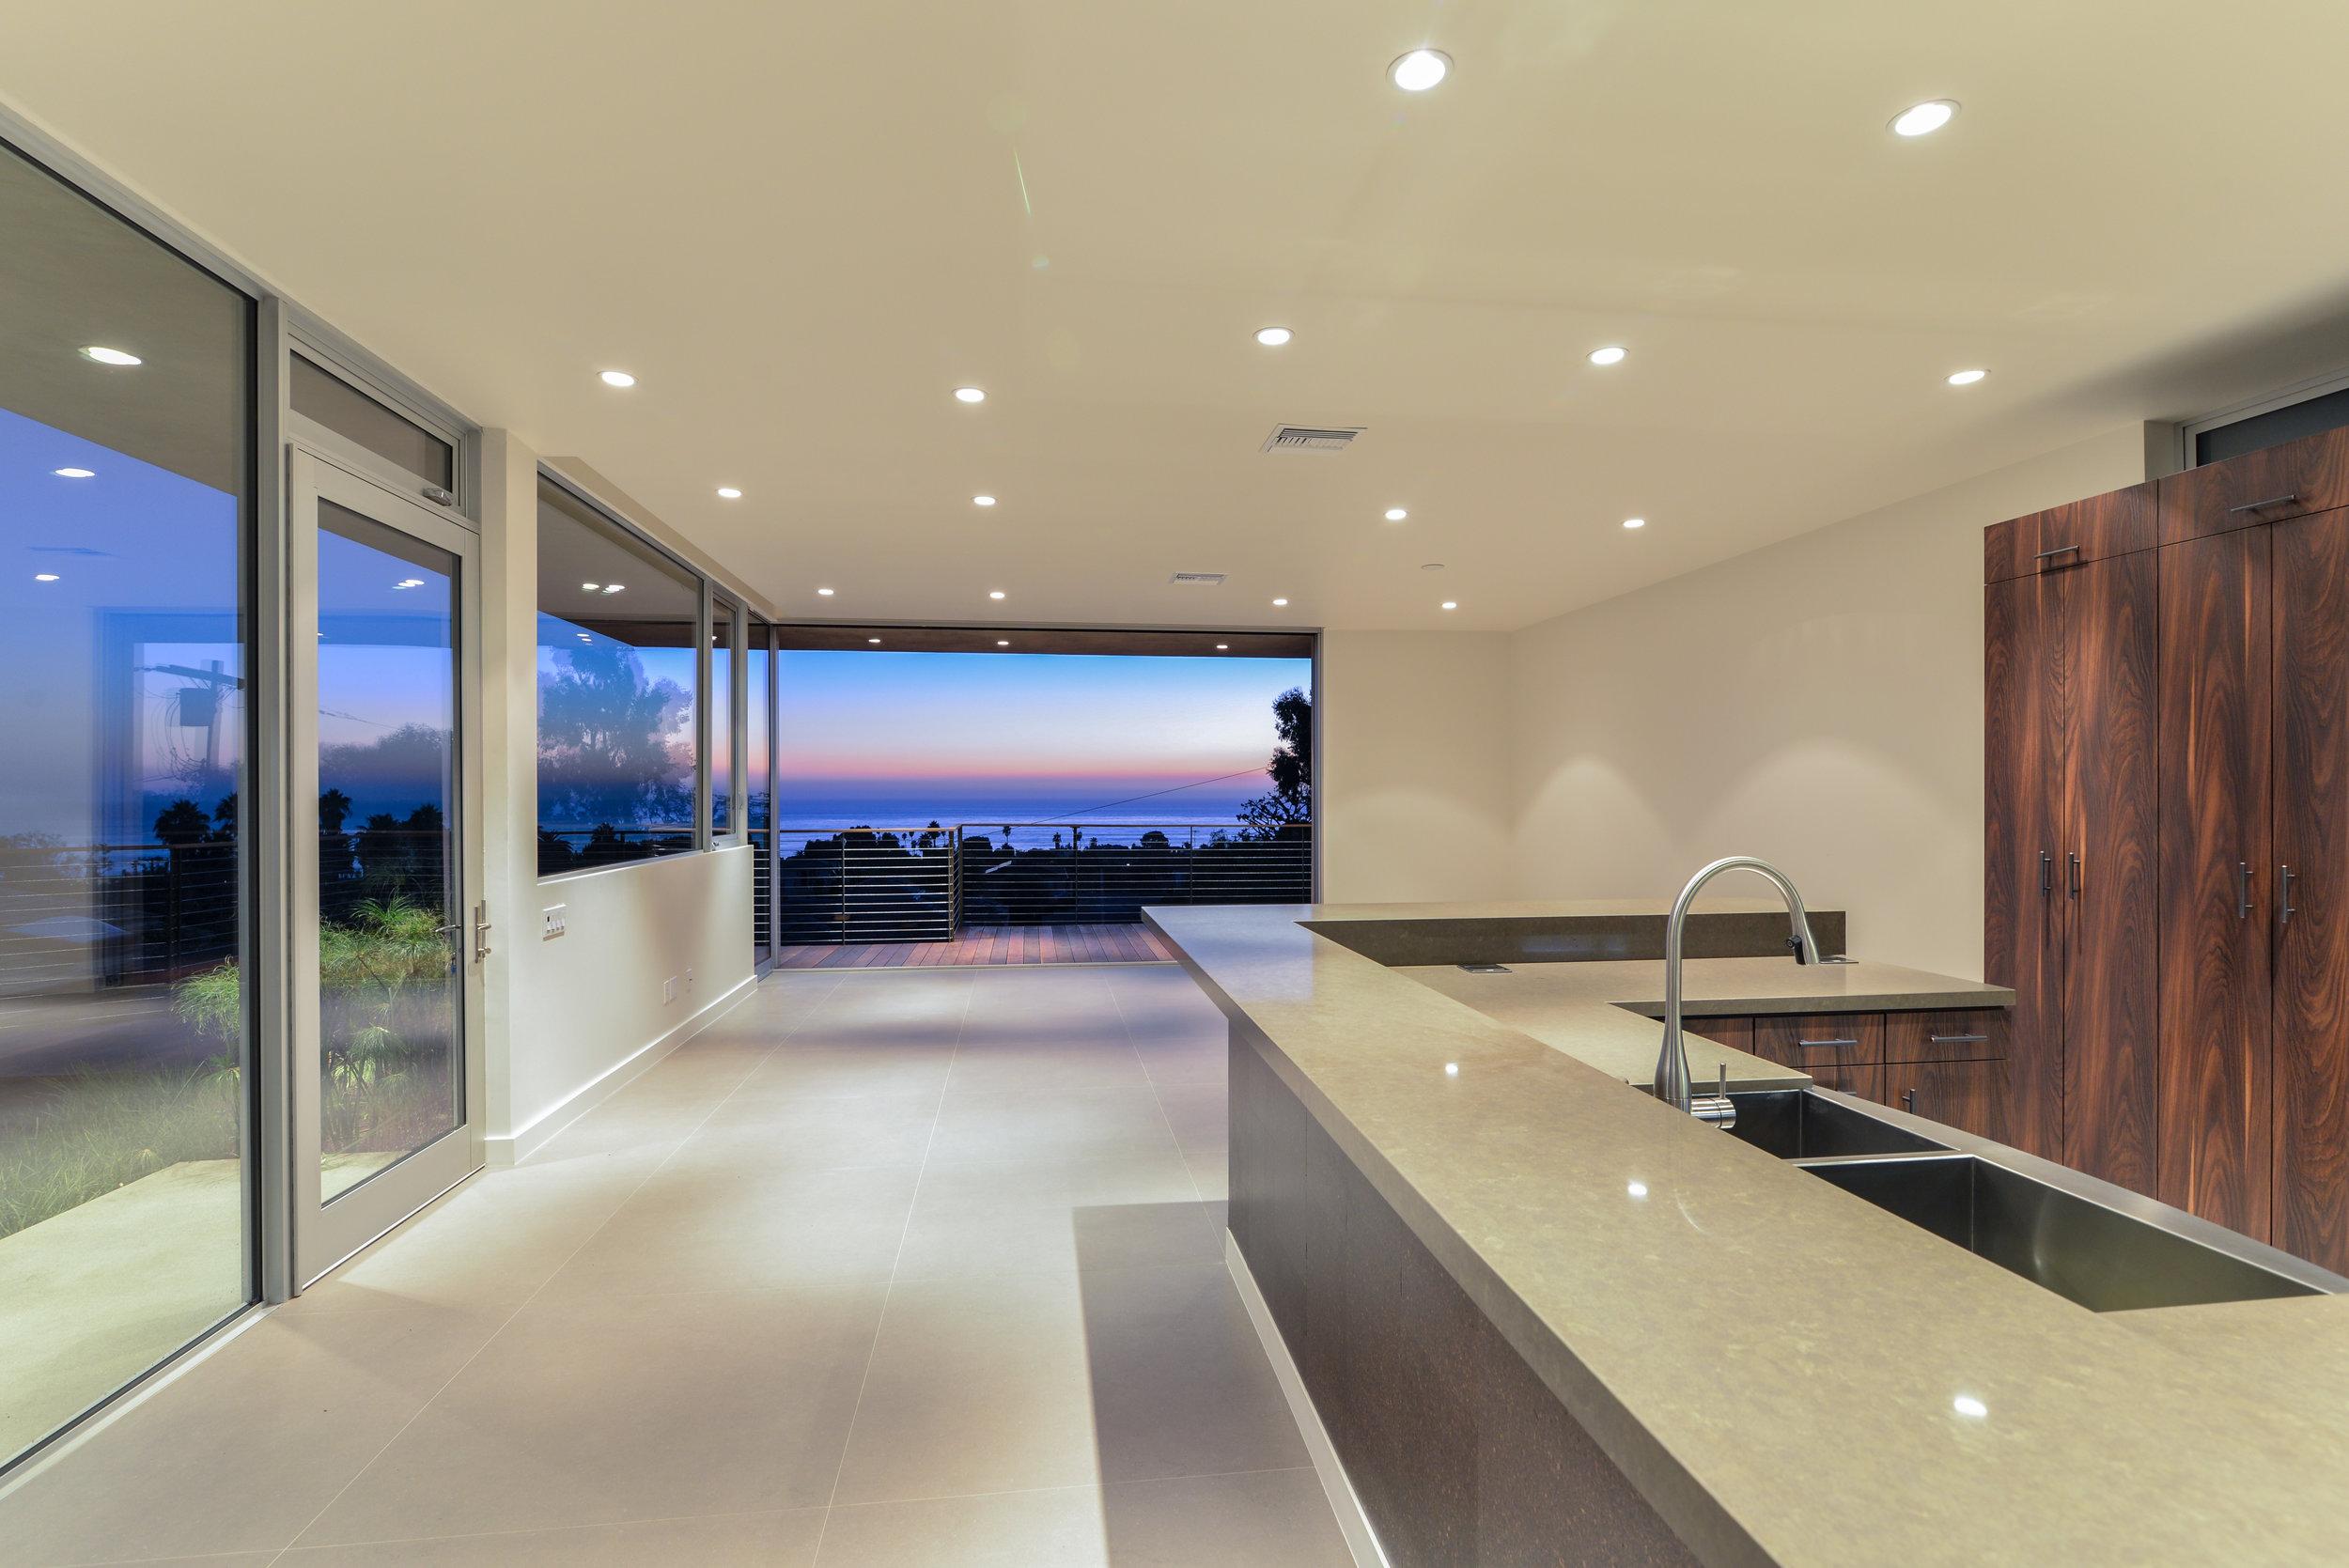 S.E.A.-Studio-Environmental-Architecture-David-Hertz-FAIA-Linda-Rosa-House-La-Jolla-San-Diego-sustainable-regenerative-restorative-design-modern-residential-mindful-garden-panoramic-ocean-view-open-concept-california-dream-5.jpg